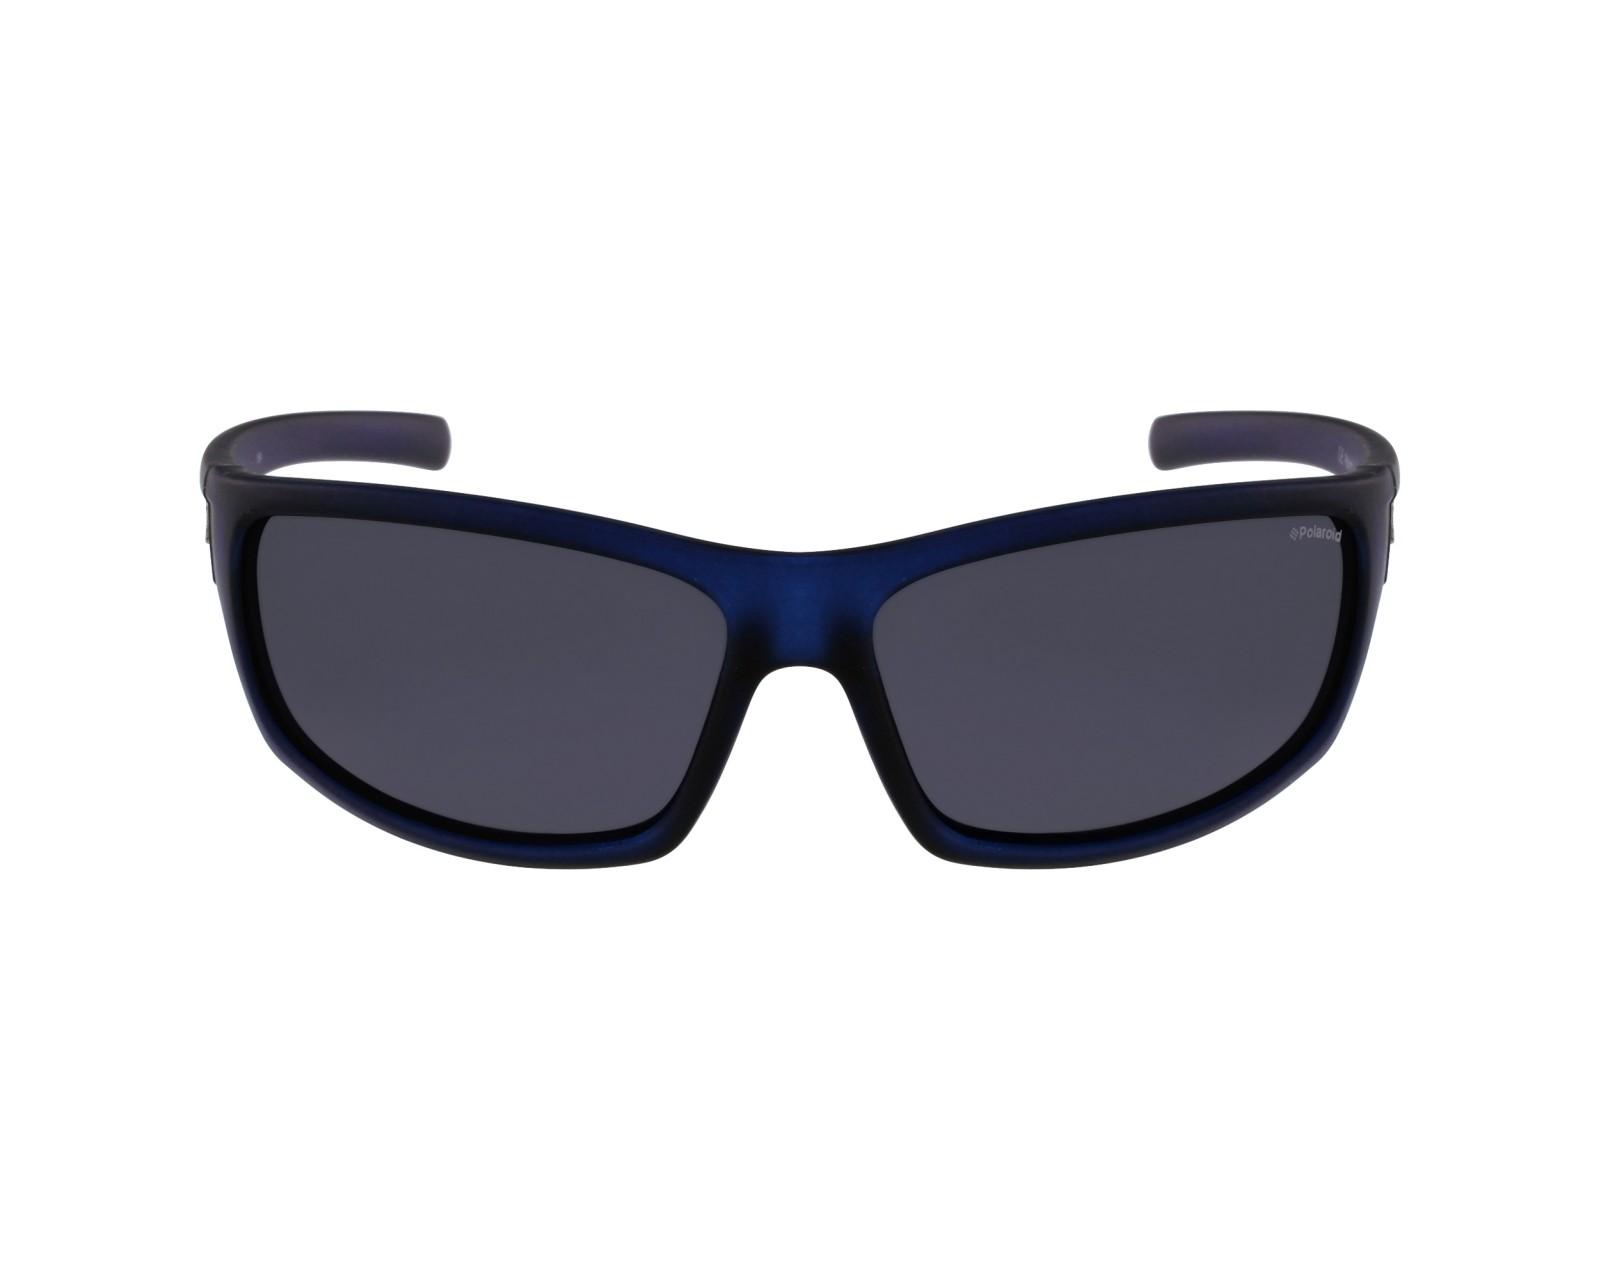 Sunglasses Polaroid P-8411 148 Y2 - Blue profile view 9fb75c9152